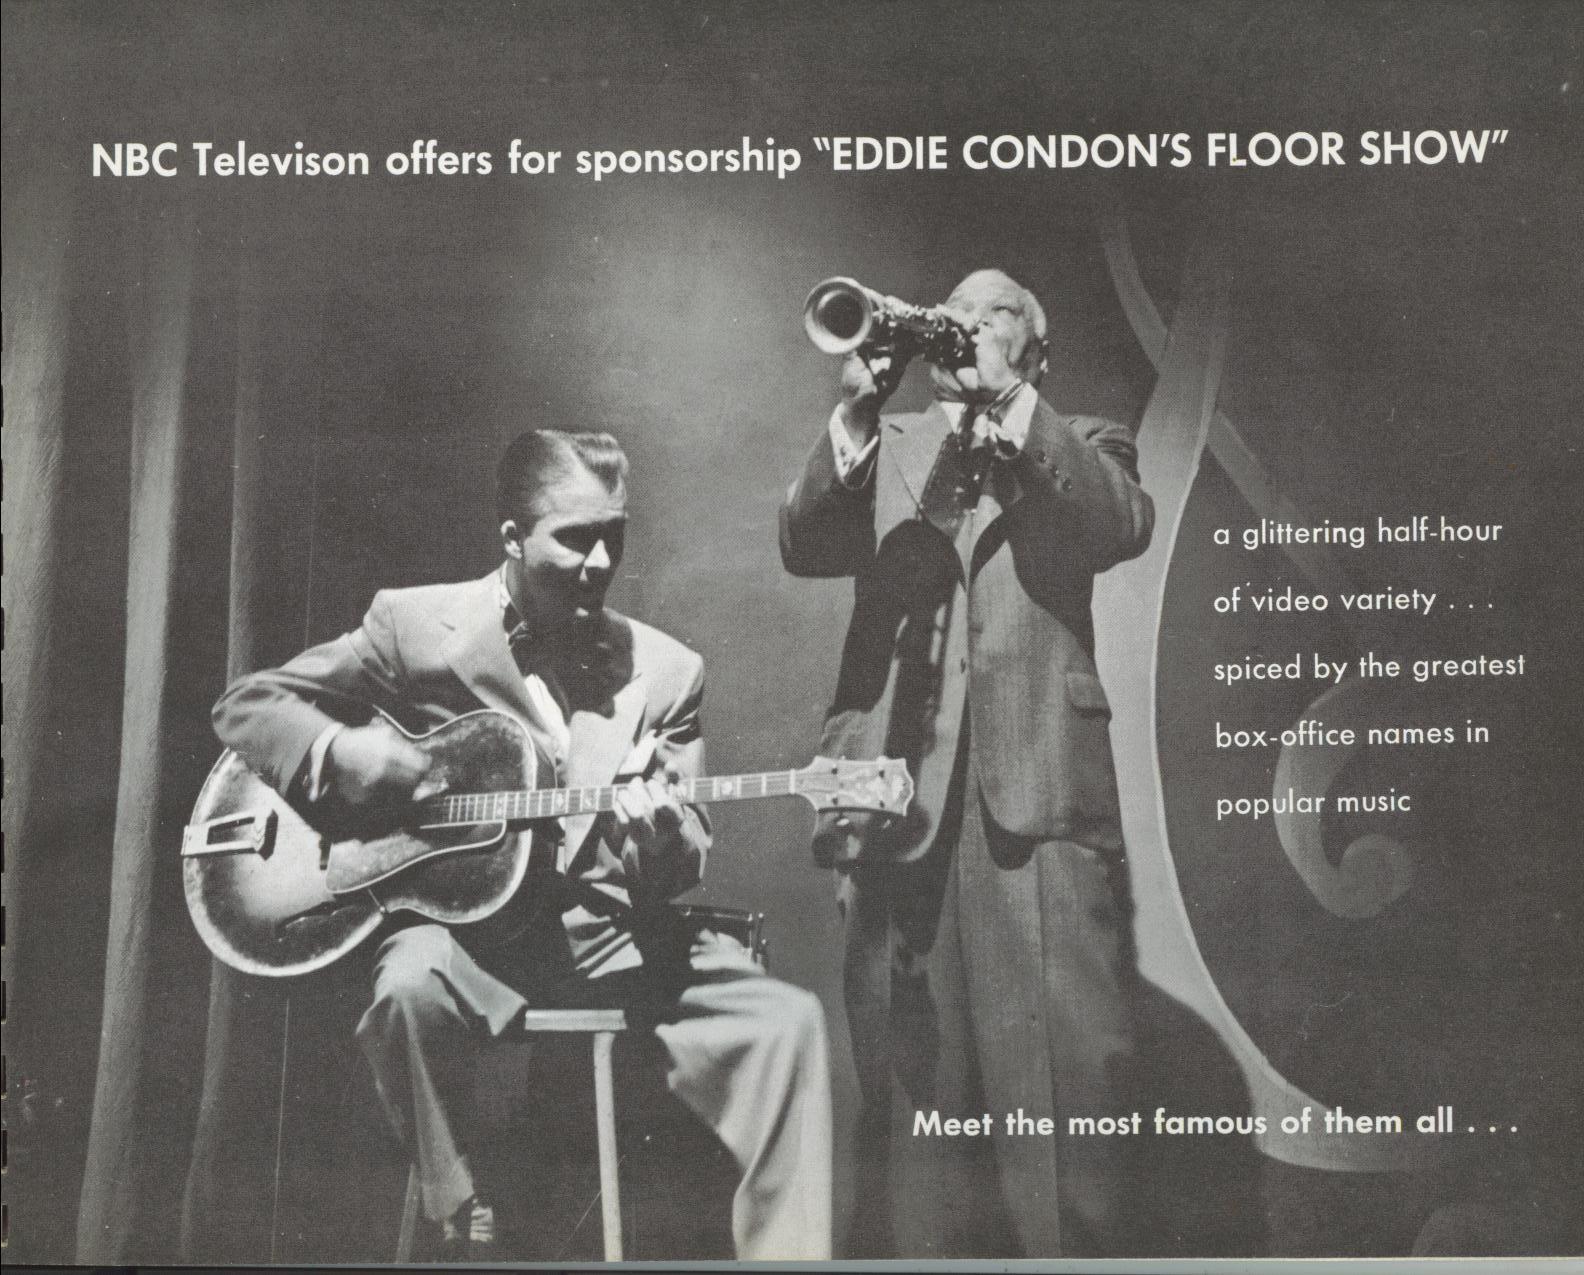 condon-floor-show-2